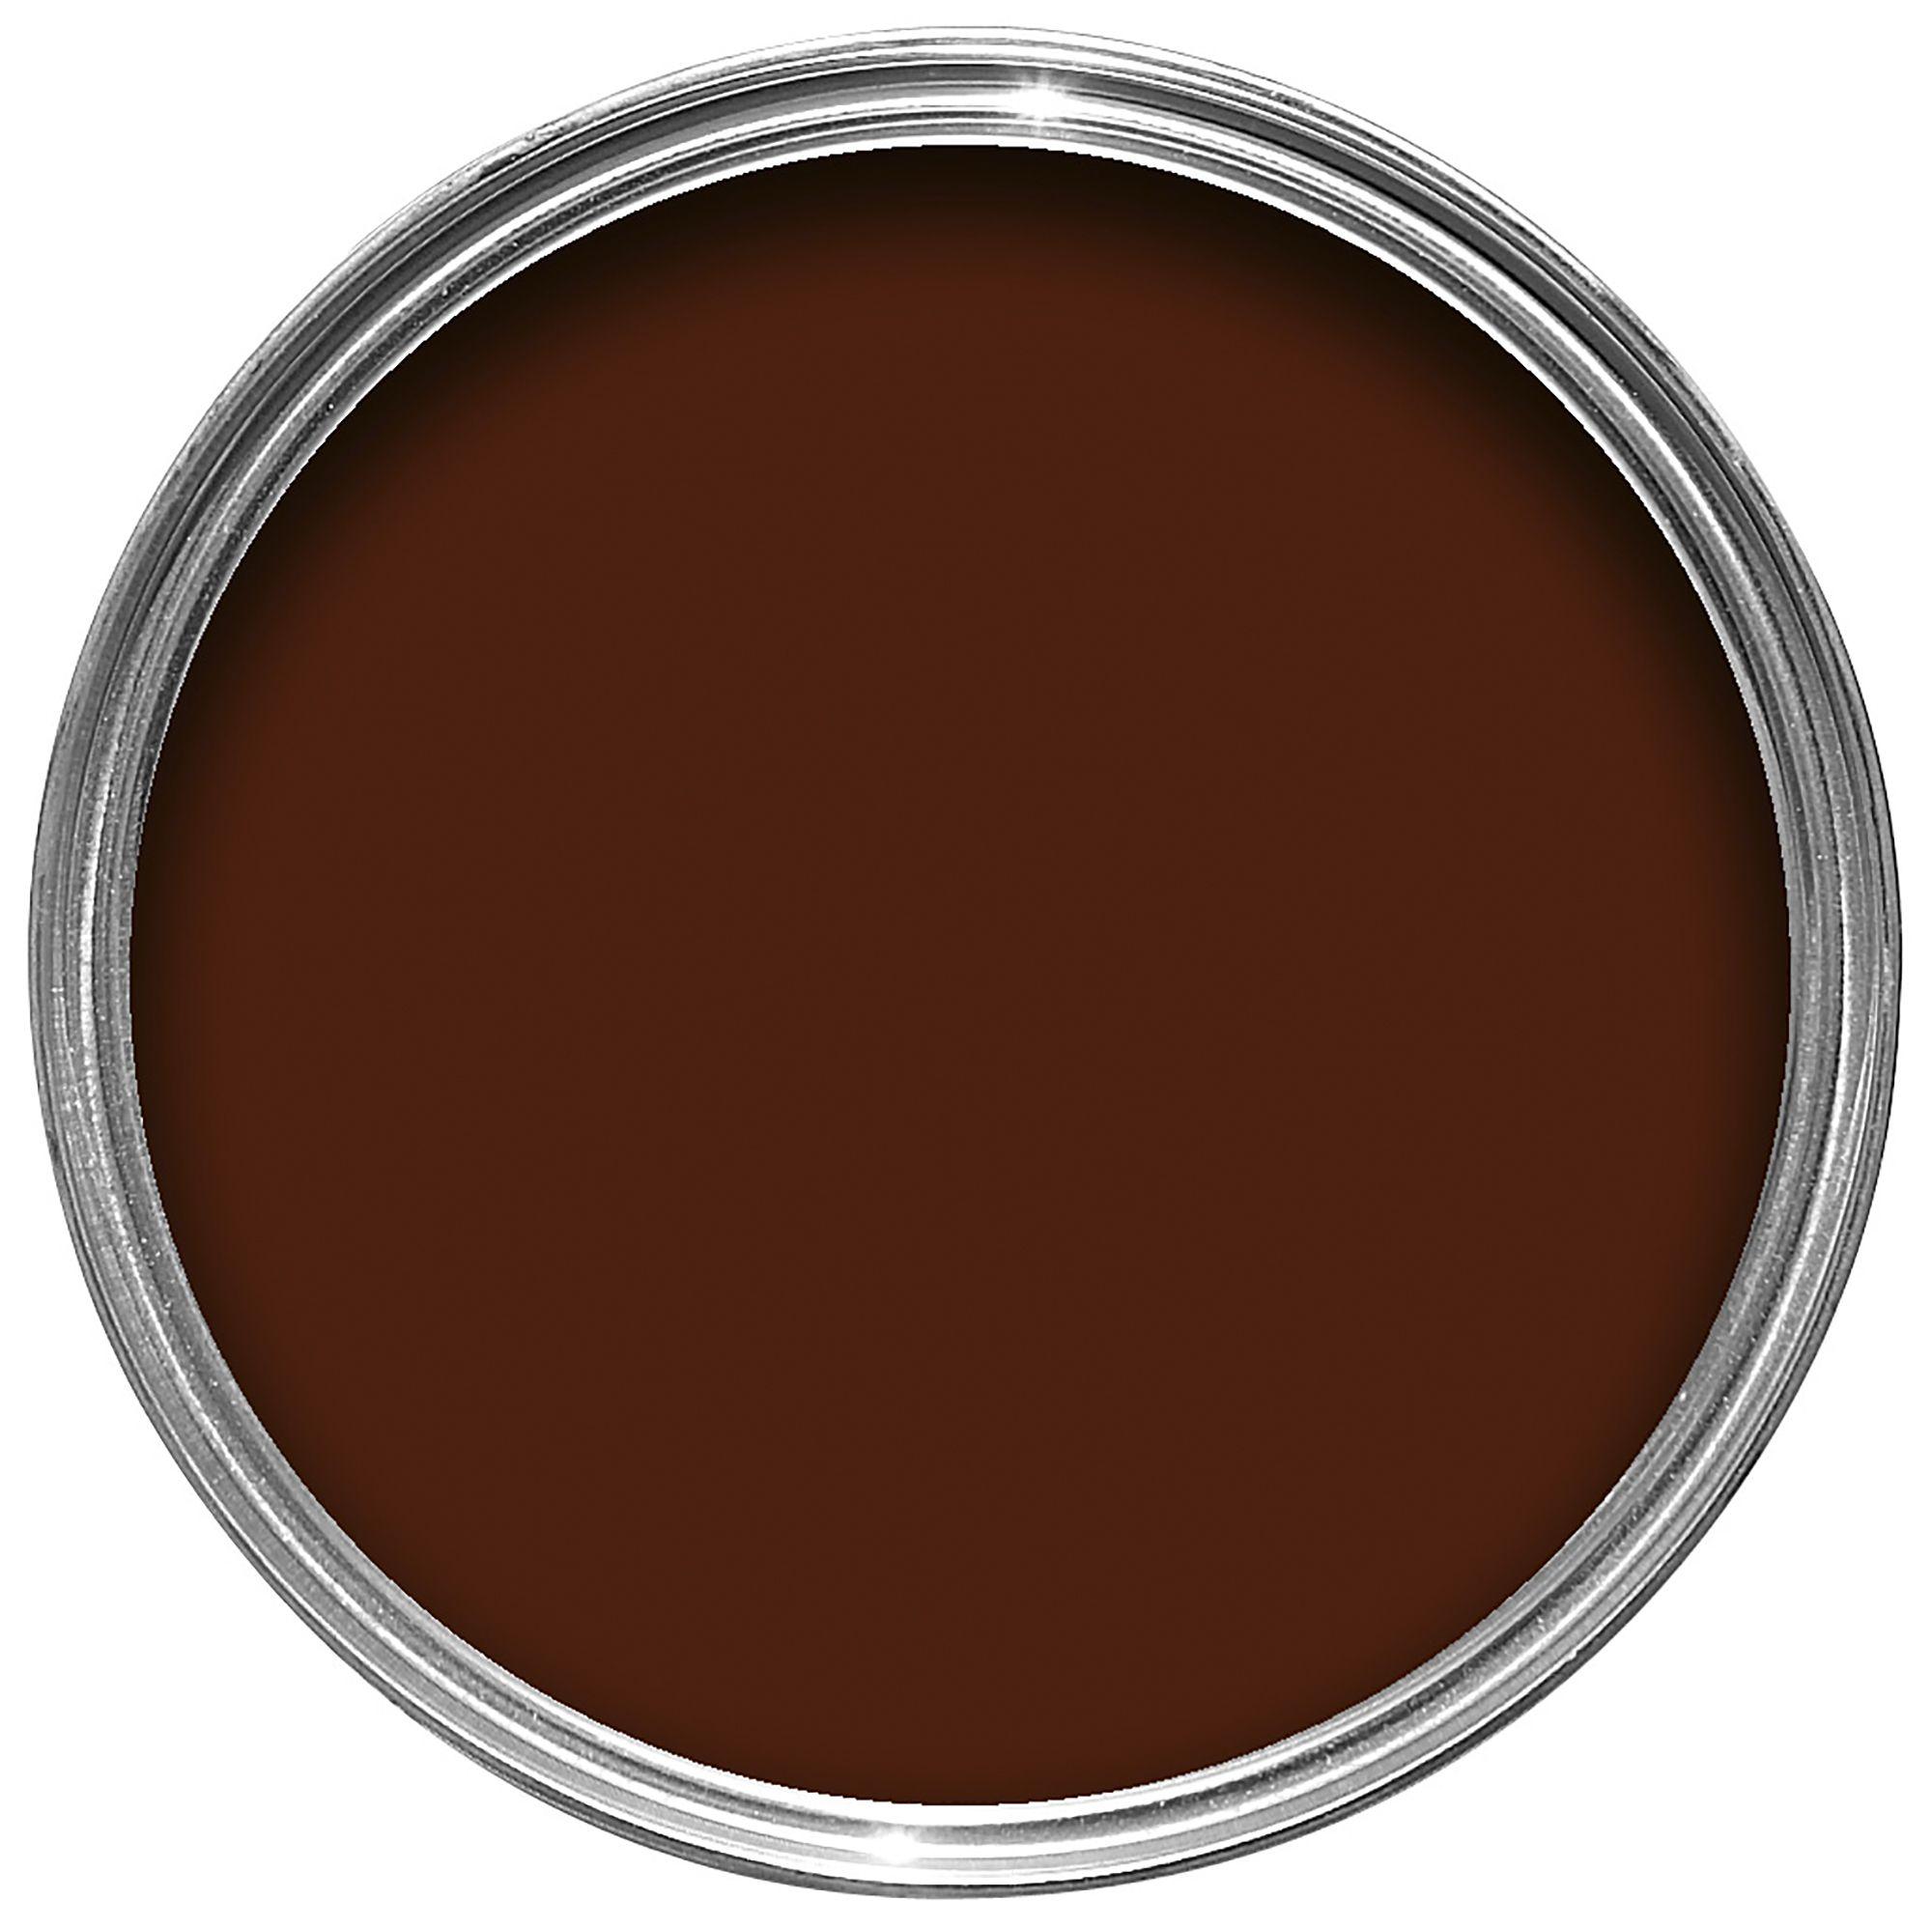 Colours exterior teak gloss wood metal paint 2 5l departments diy at b q - Sandtex exterior gloss paint paint ...